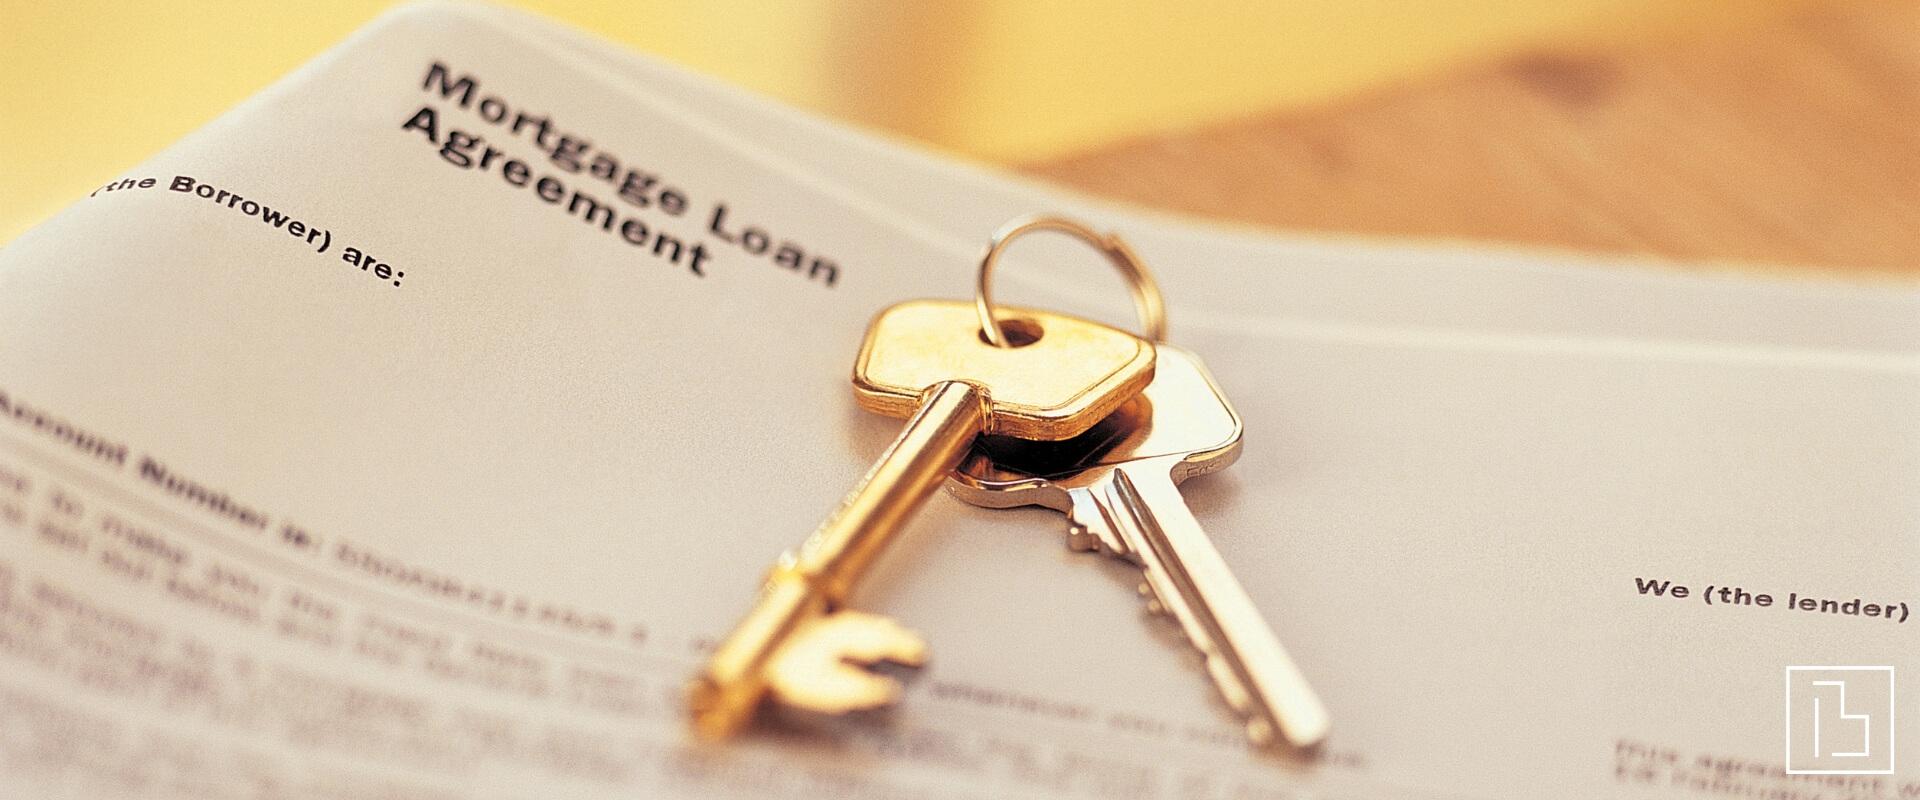 Set of keys on top of a mortgage document - Beachworks LLC